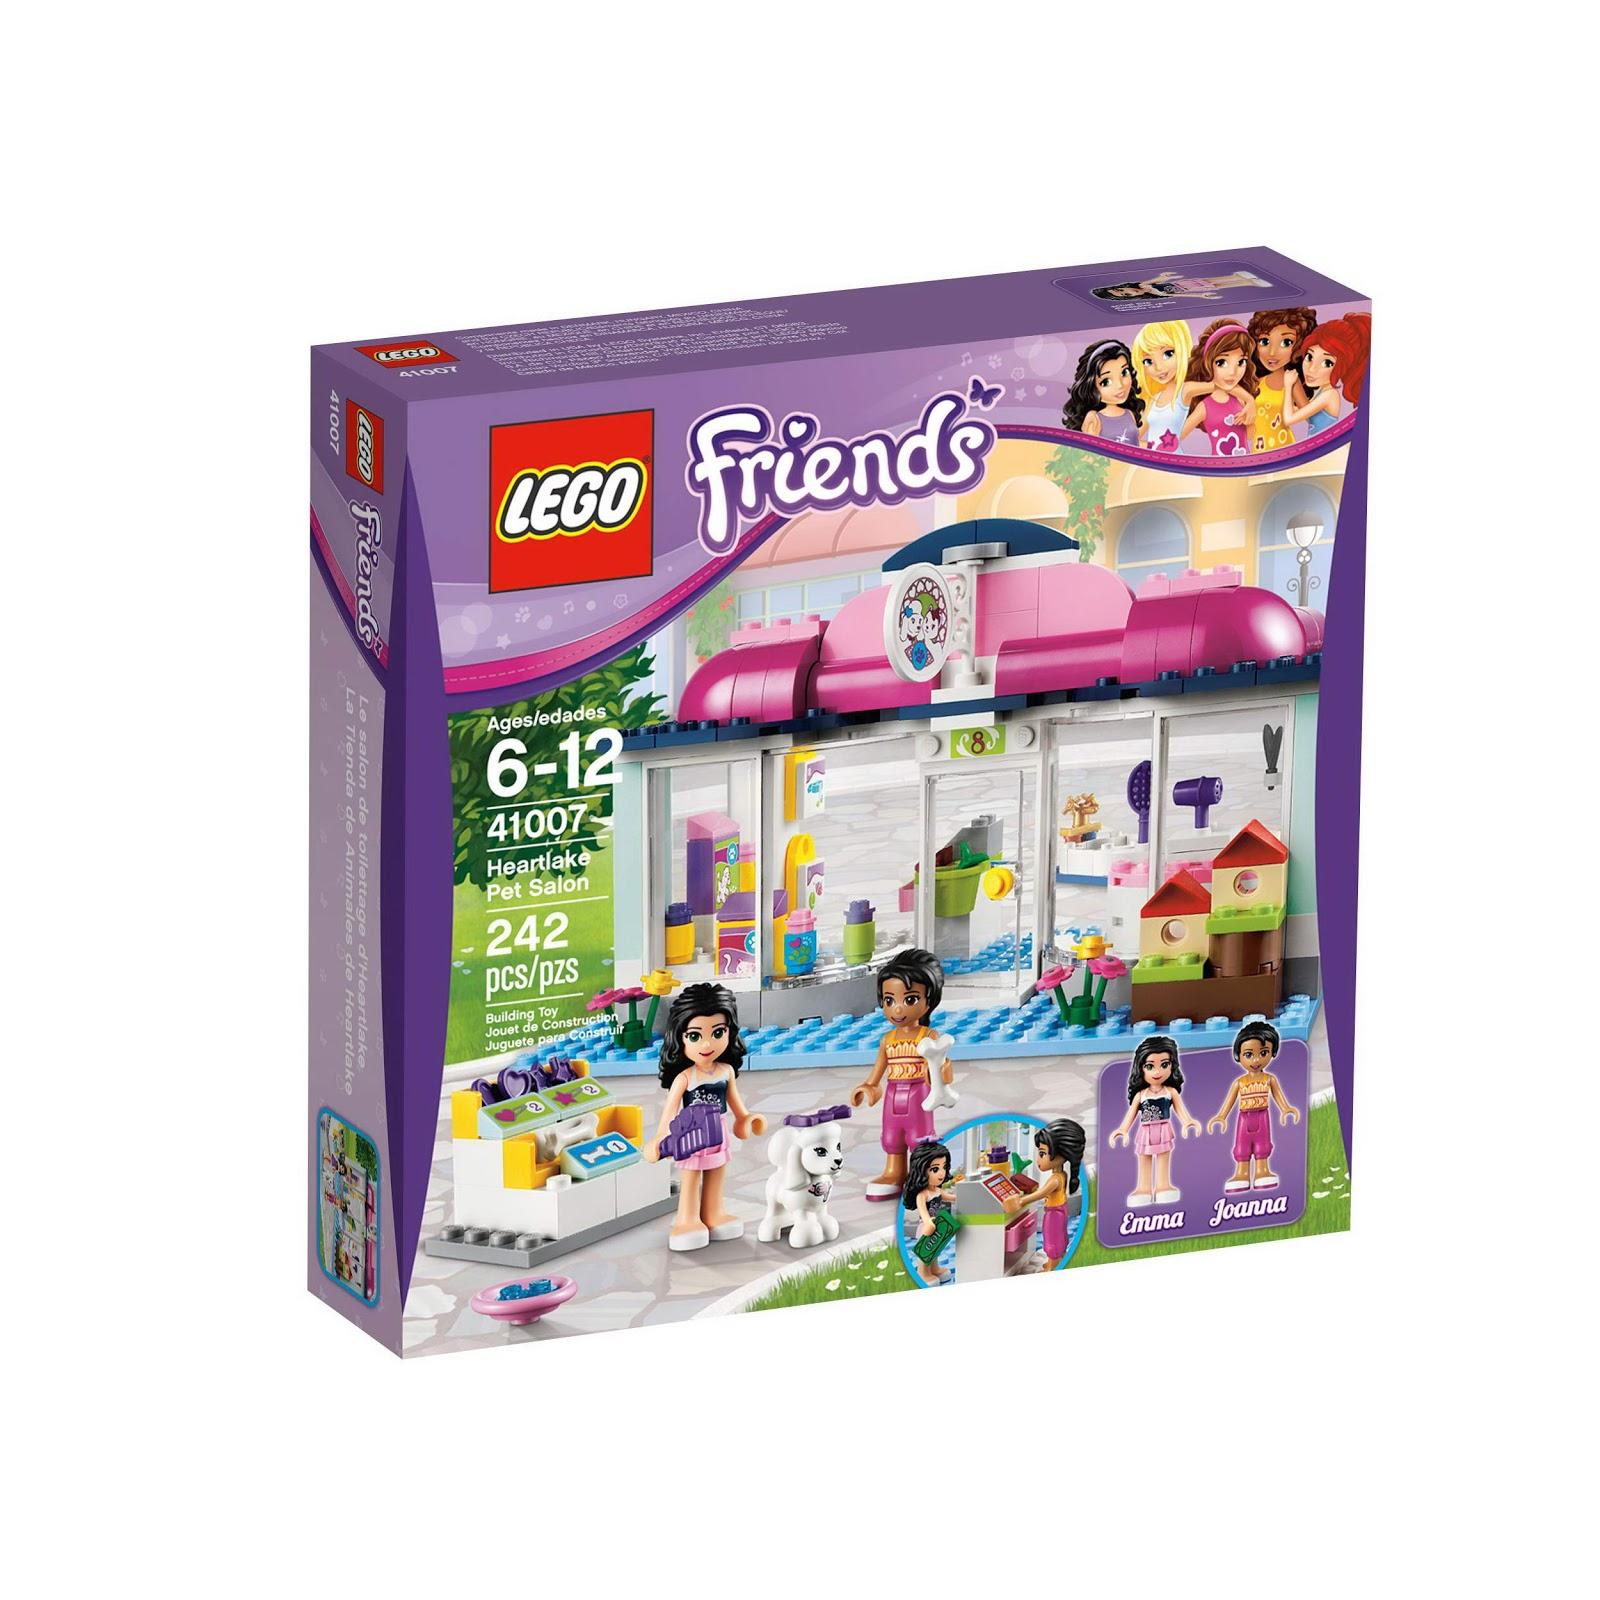 Brick Friends: LEGO 41007 Heartlake Pet Salon